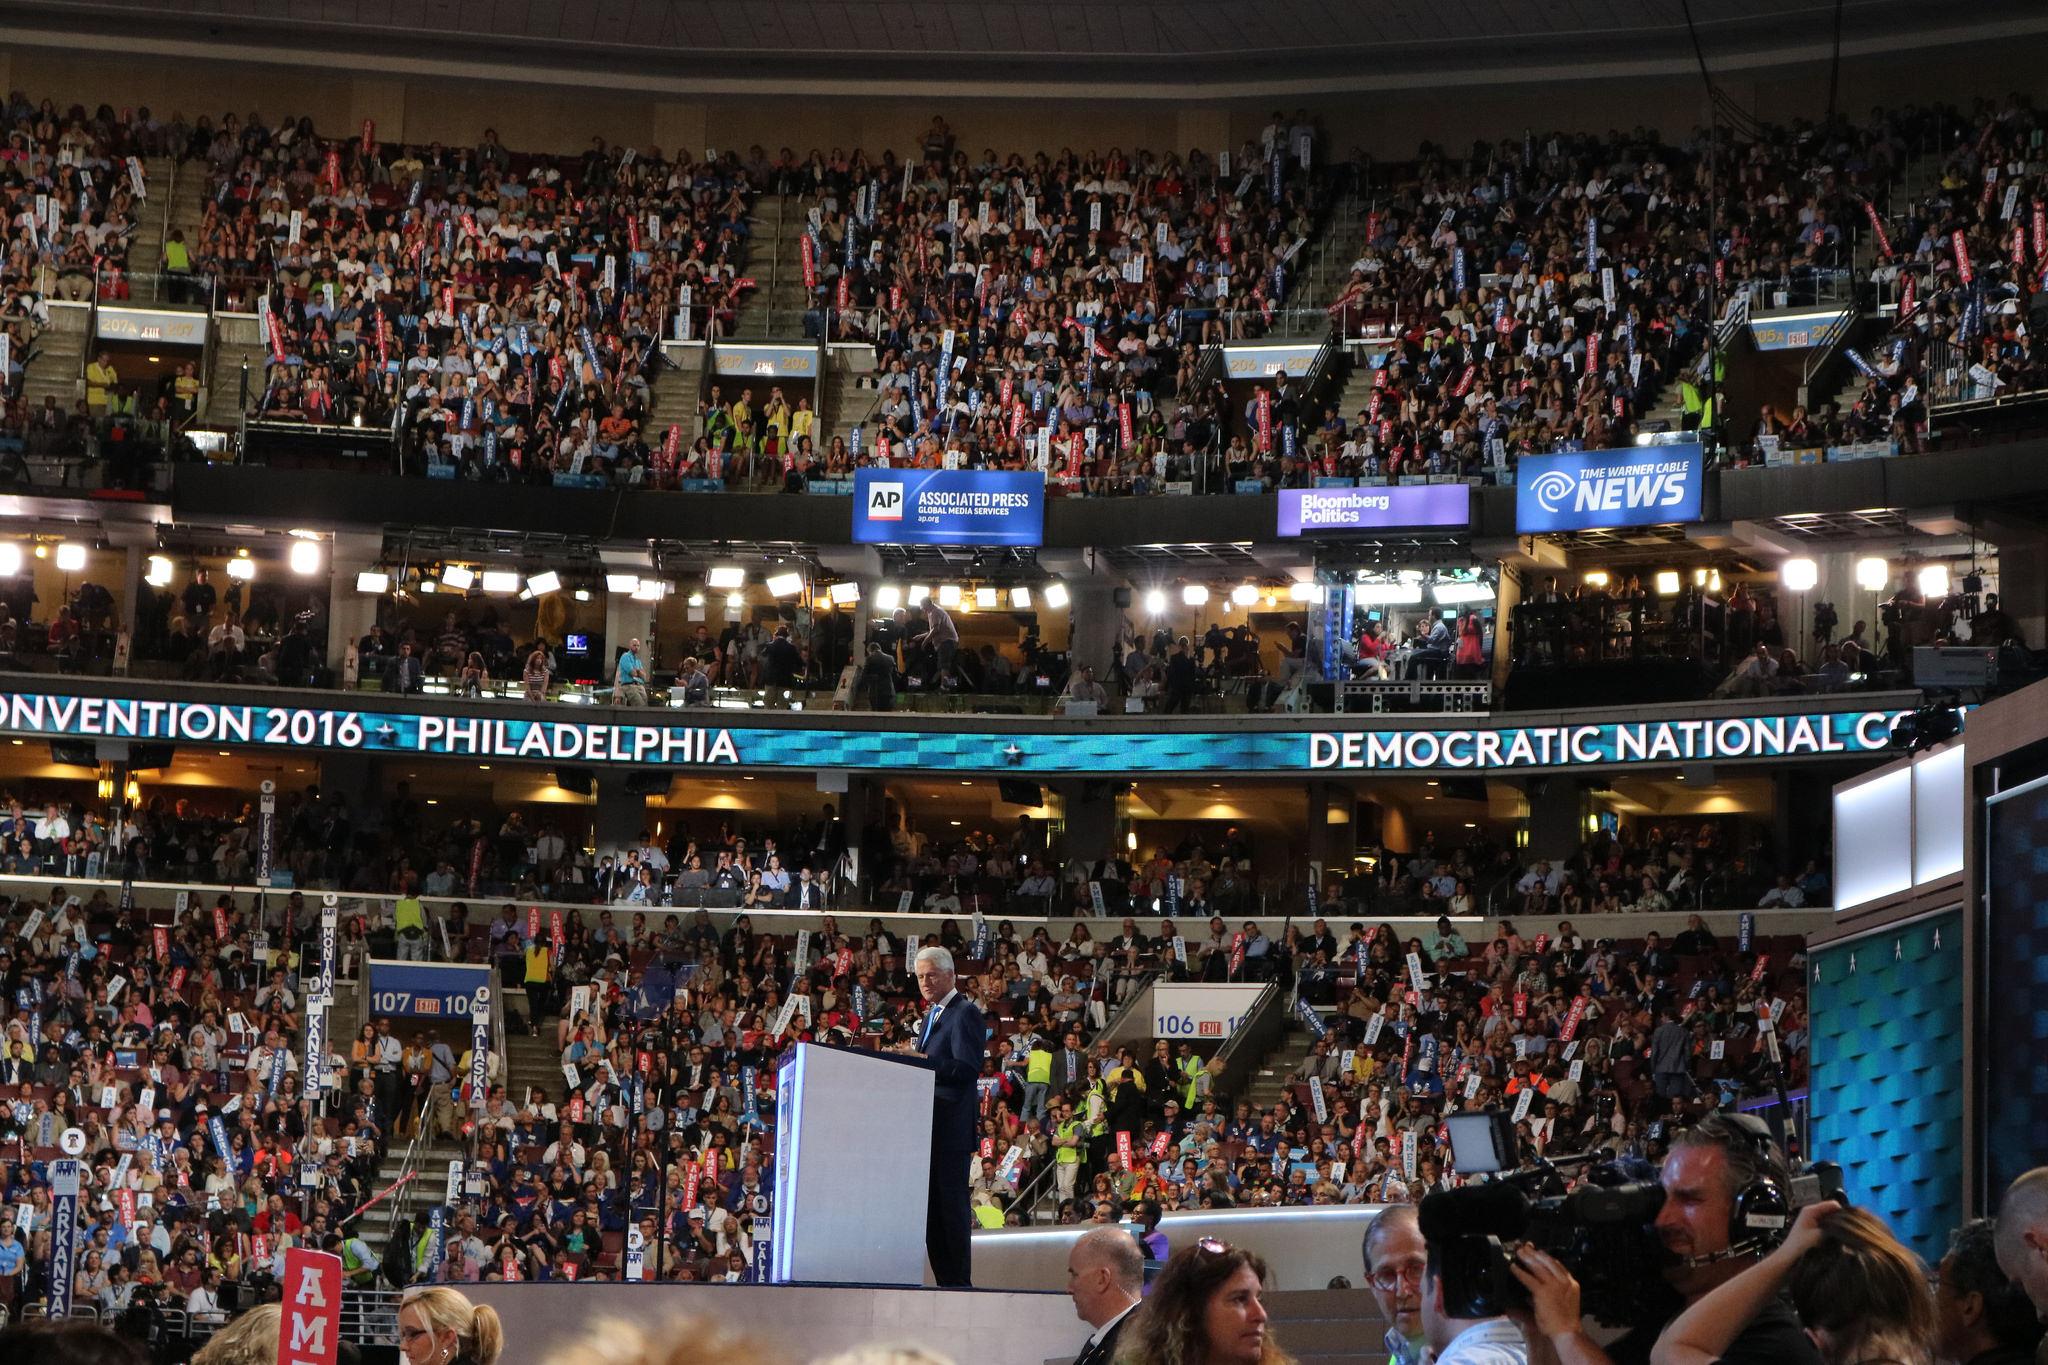 Bill Clinton speaking at the DNC, Photo courtesy of Haddad Media